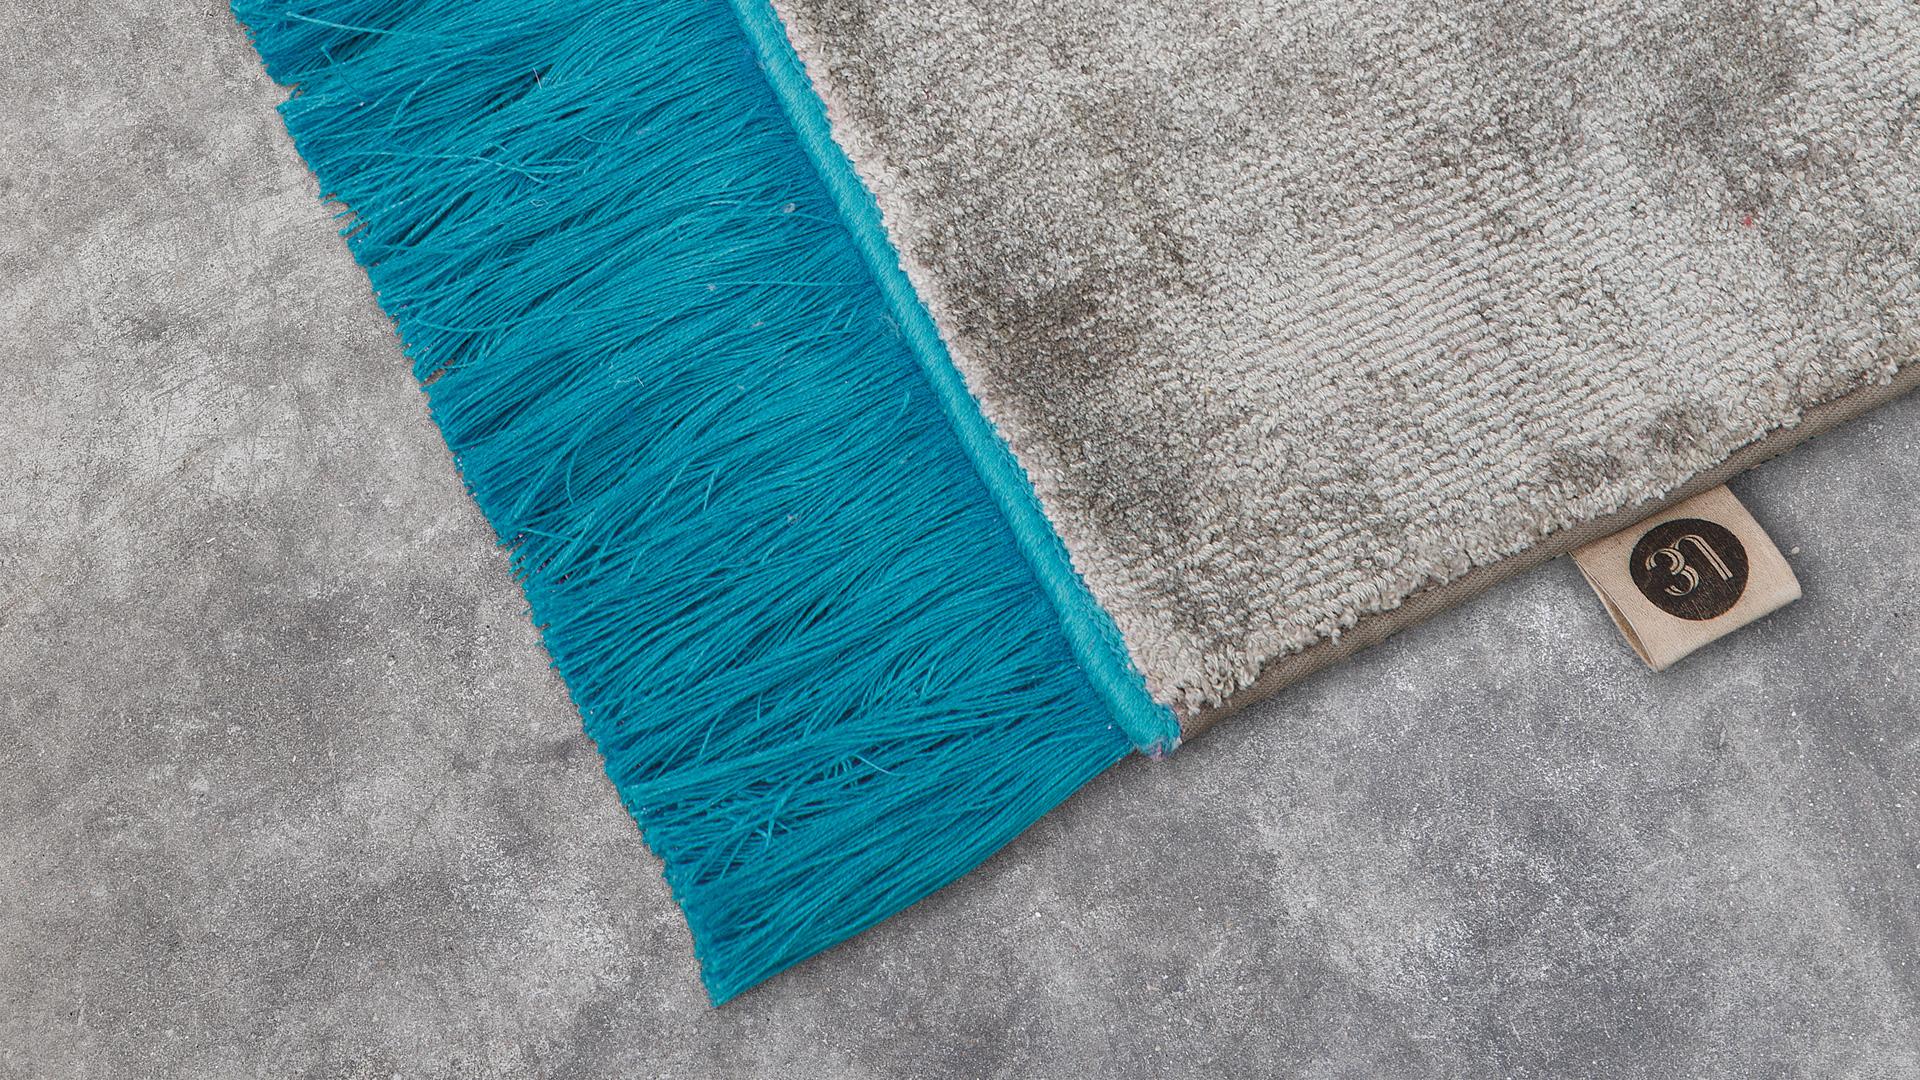 02-VoceDi-Limited-Edition-carpet.jpg